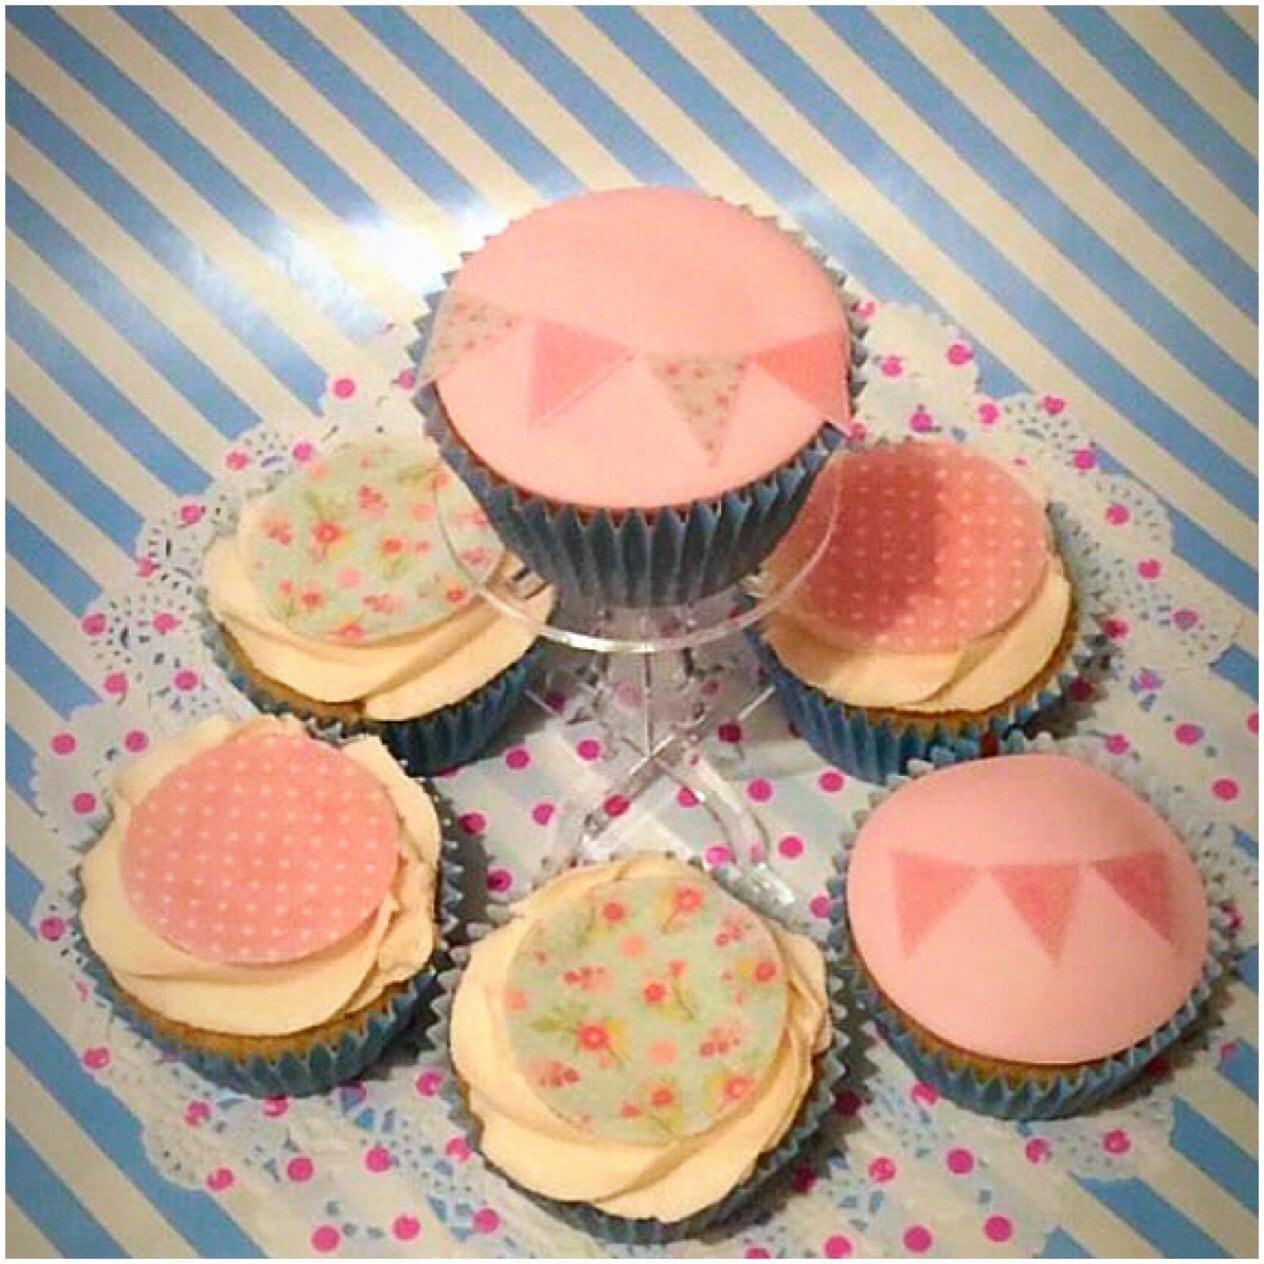 Greensborough Cake Decorating Trading Hours : Vintage Edible Bunting, Cake Decorating Kit, Birthday Cake ...